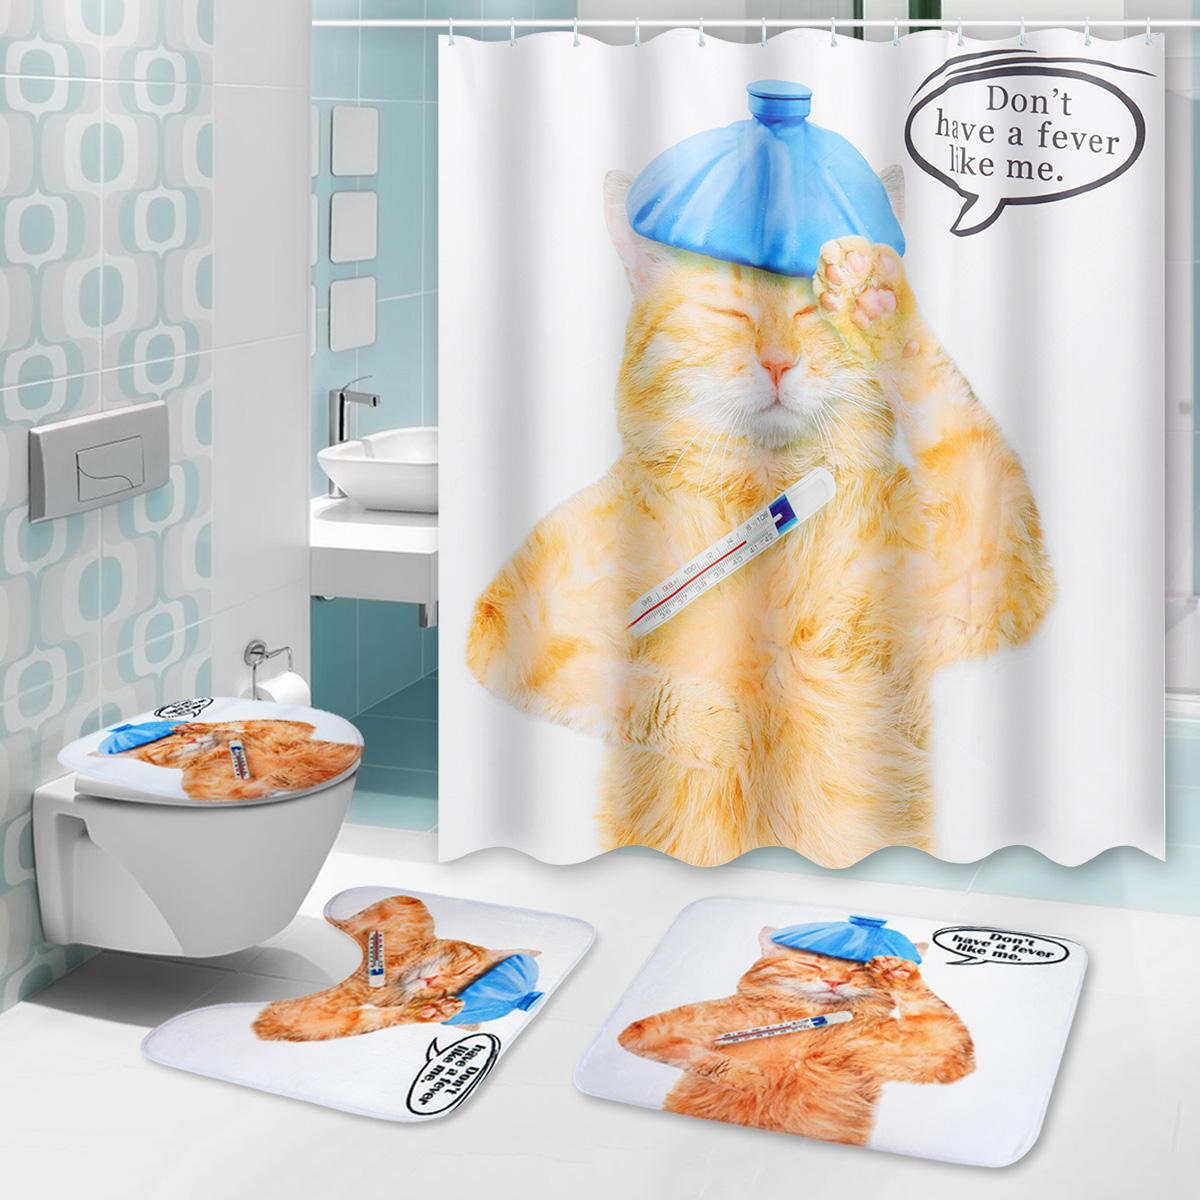 150 180x180cm Cat Bathroom Waterproof Shower Curtain With 12 White Plastic C Shaped Hooks